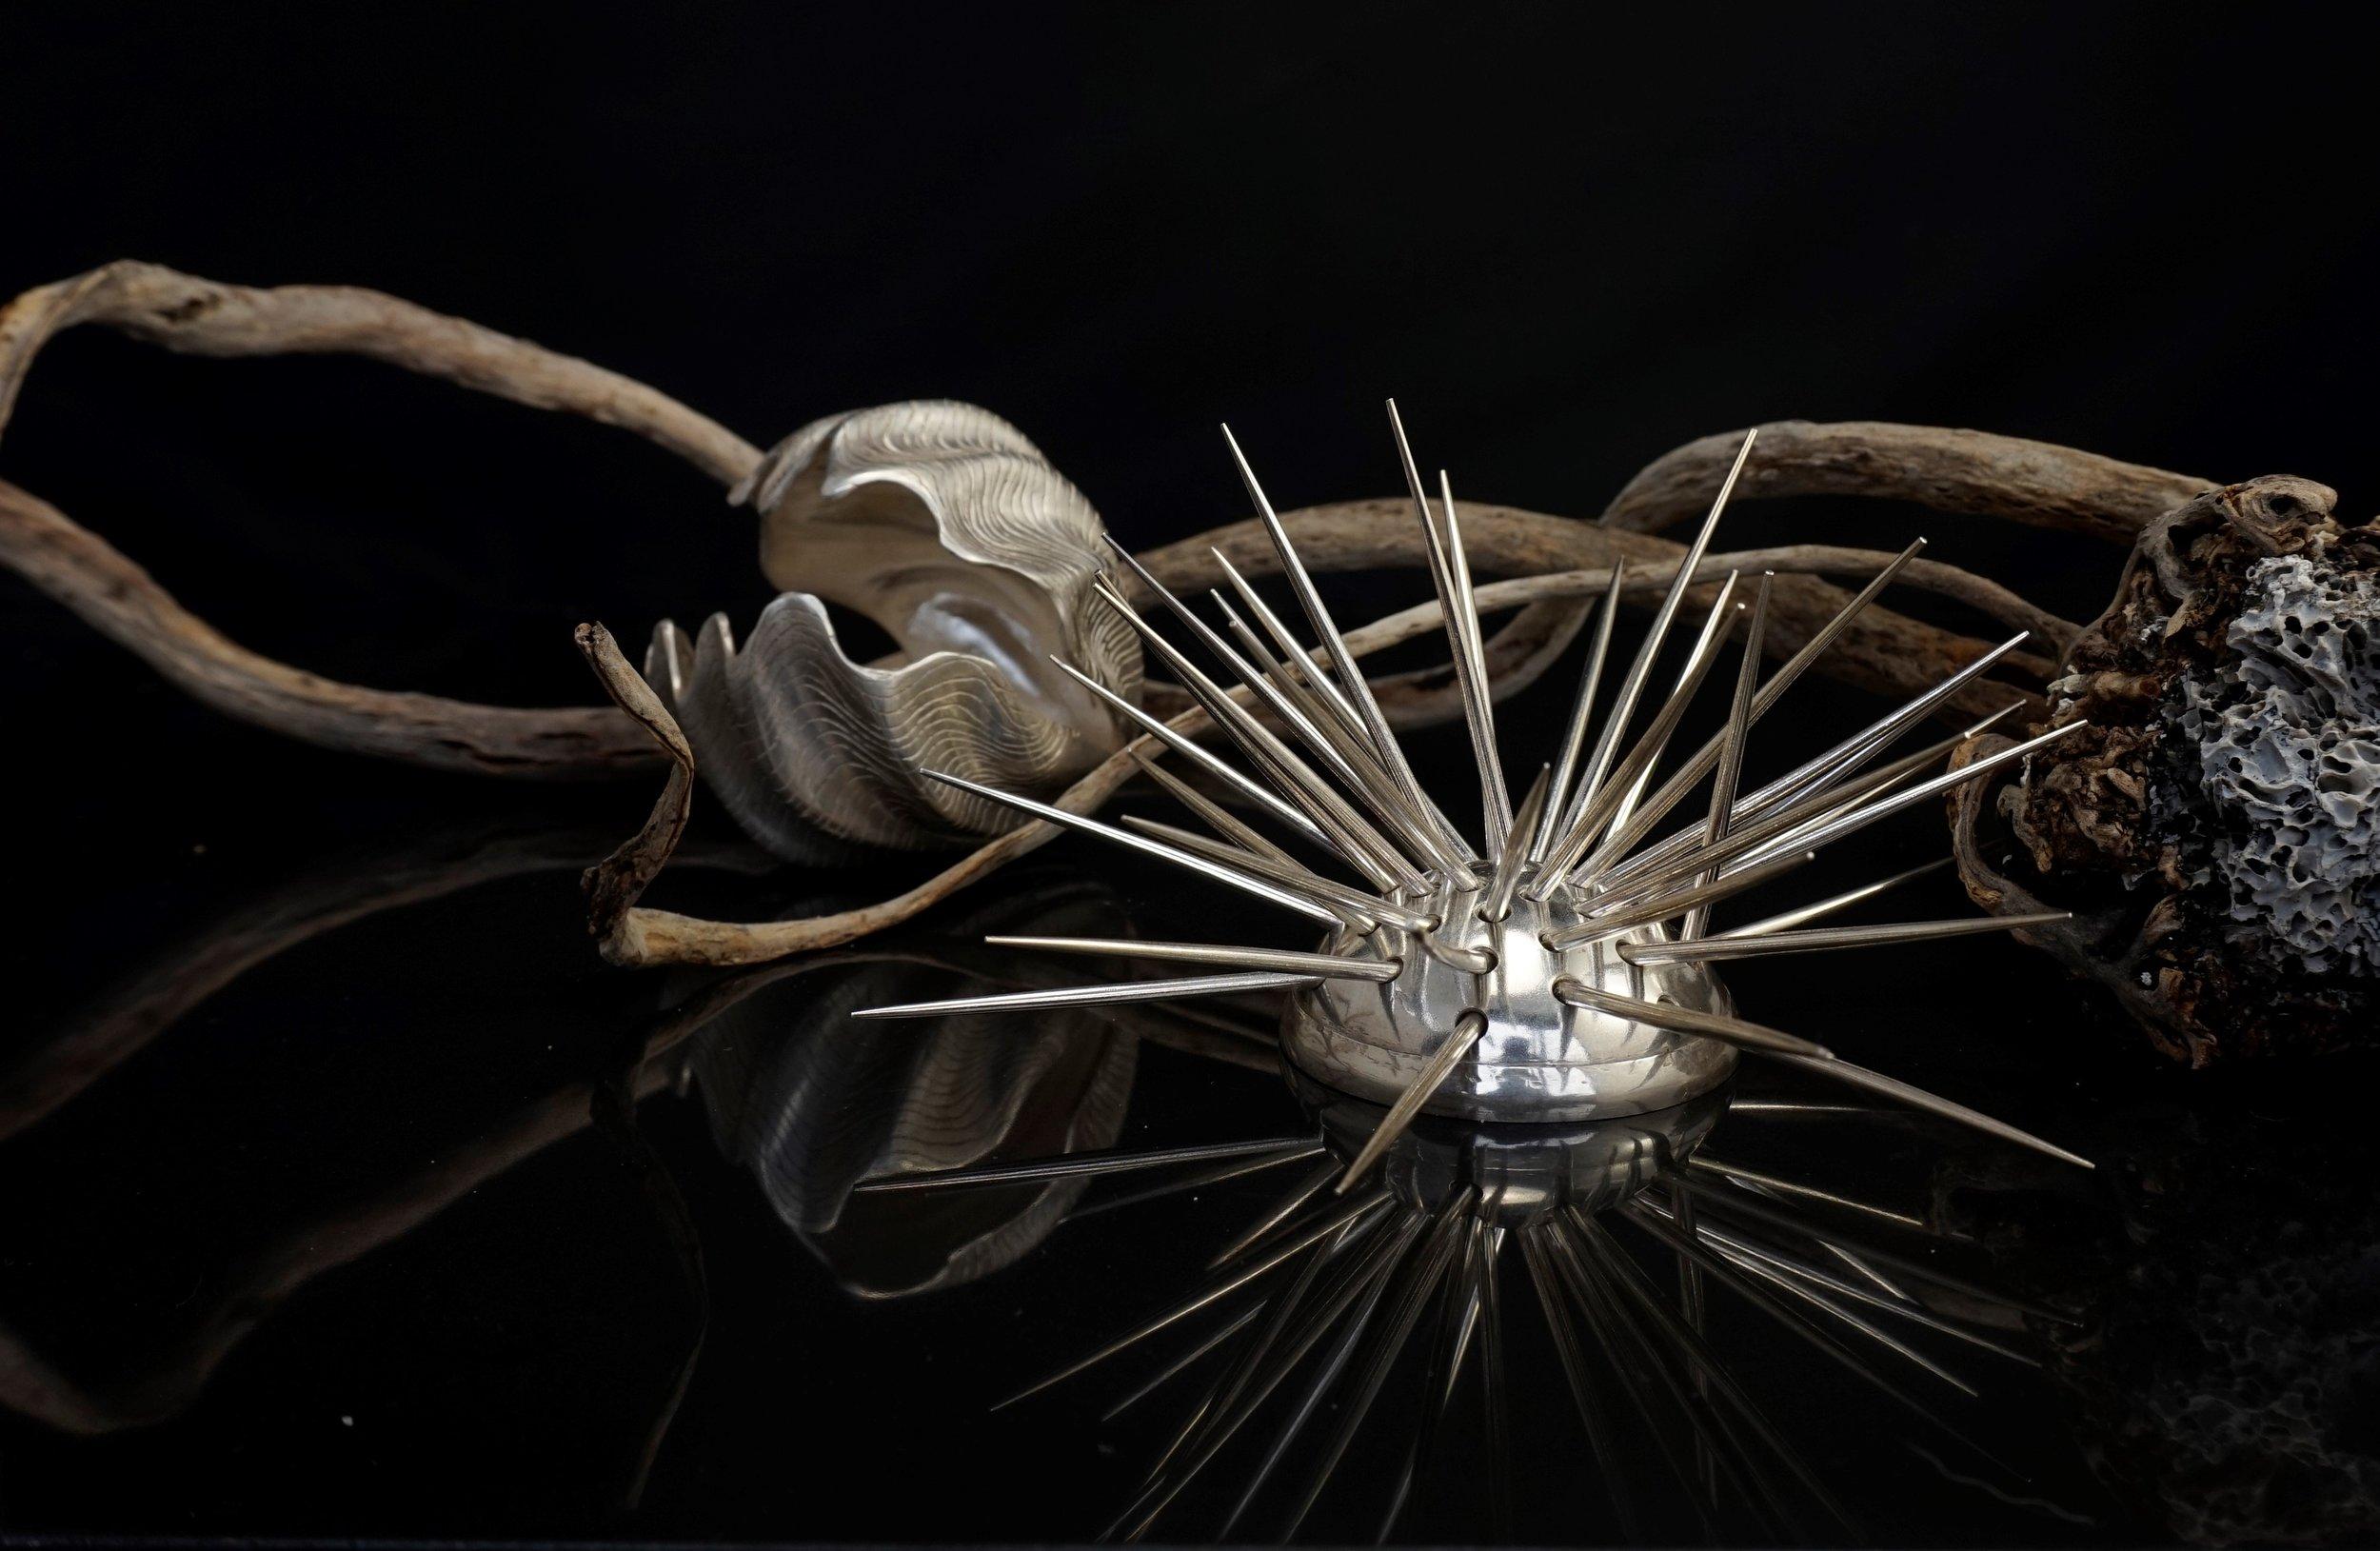 Serena Bartok | Sea Urchin and Clam Shell